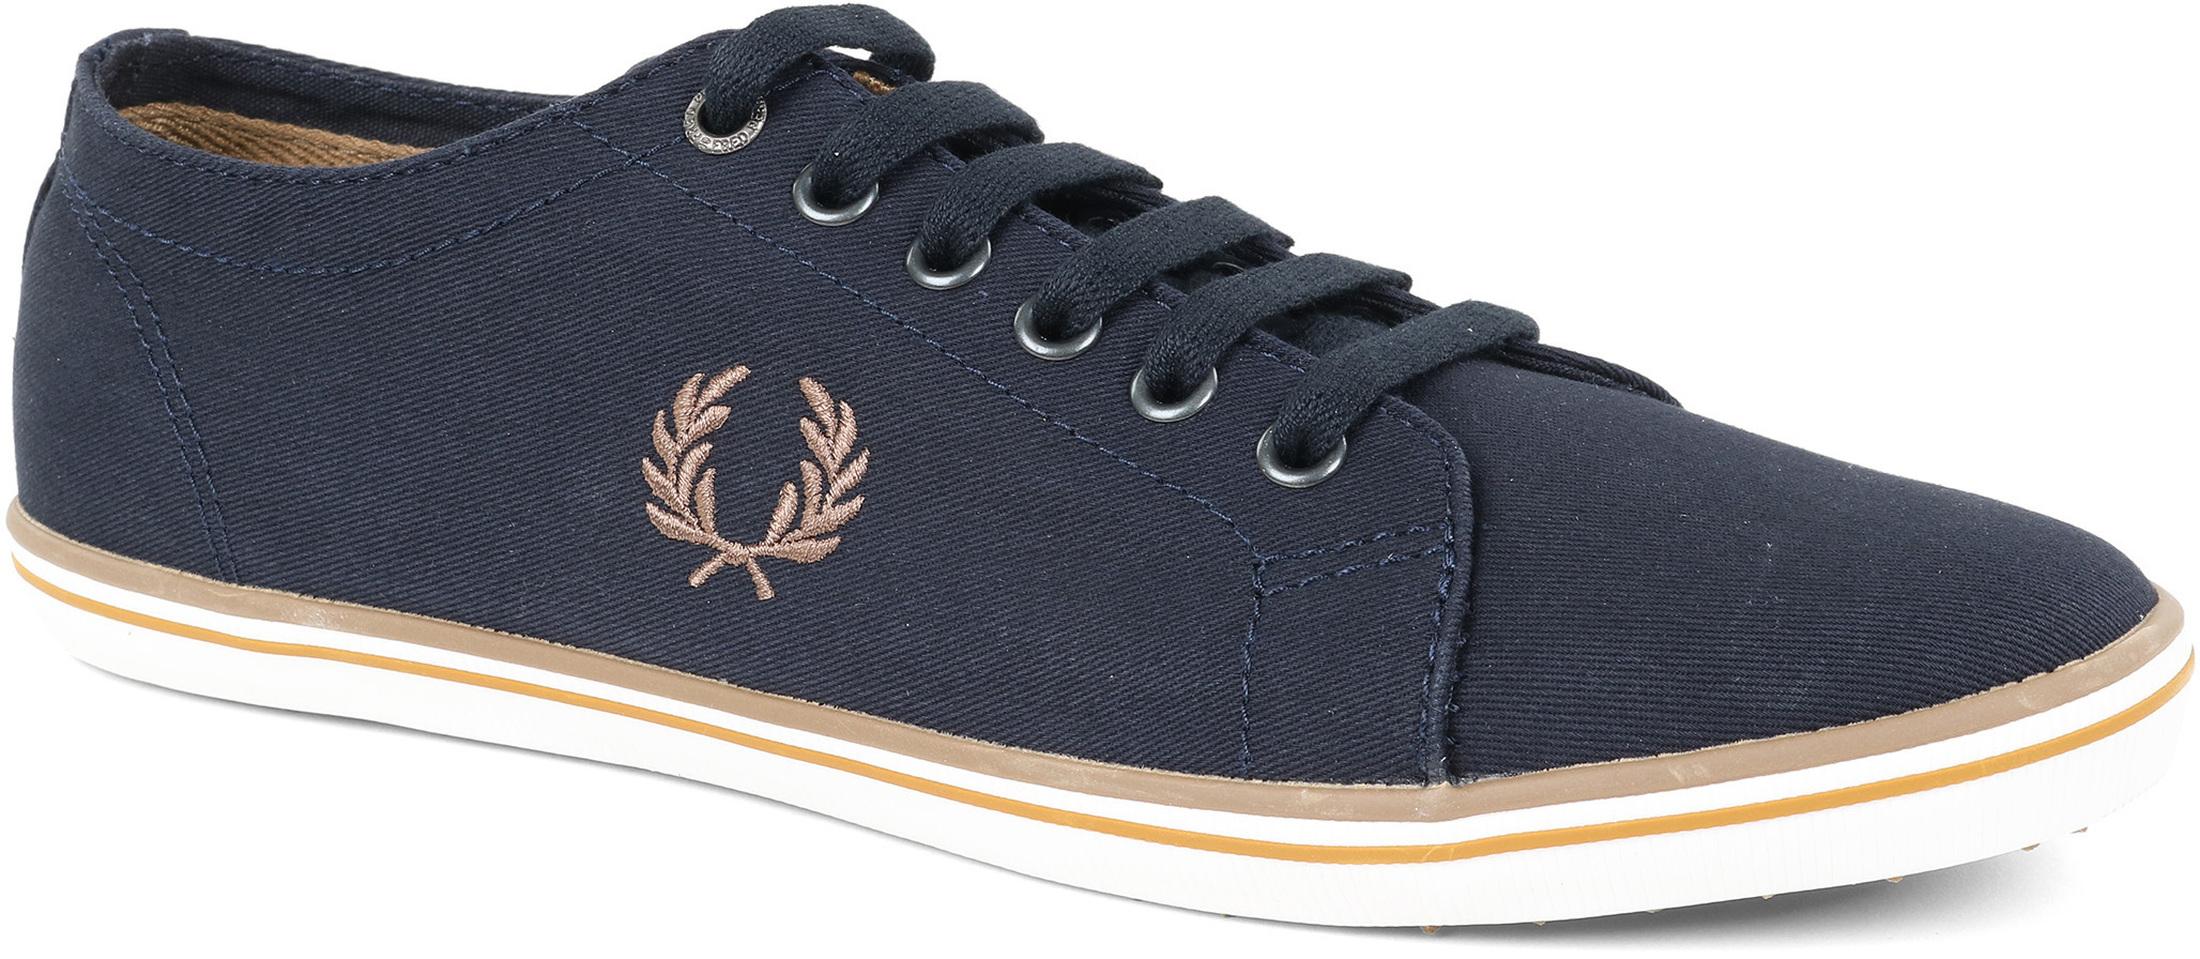 Dark Kingston Perry 248 B6259u Navy Sneaker Blue Twill Fred RL4Aj35